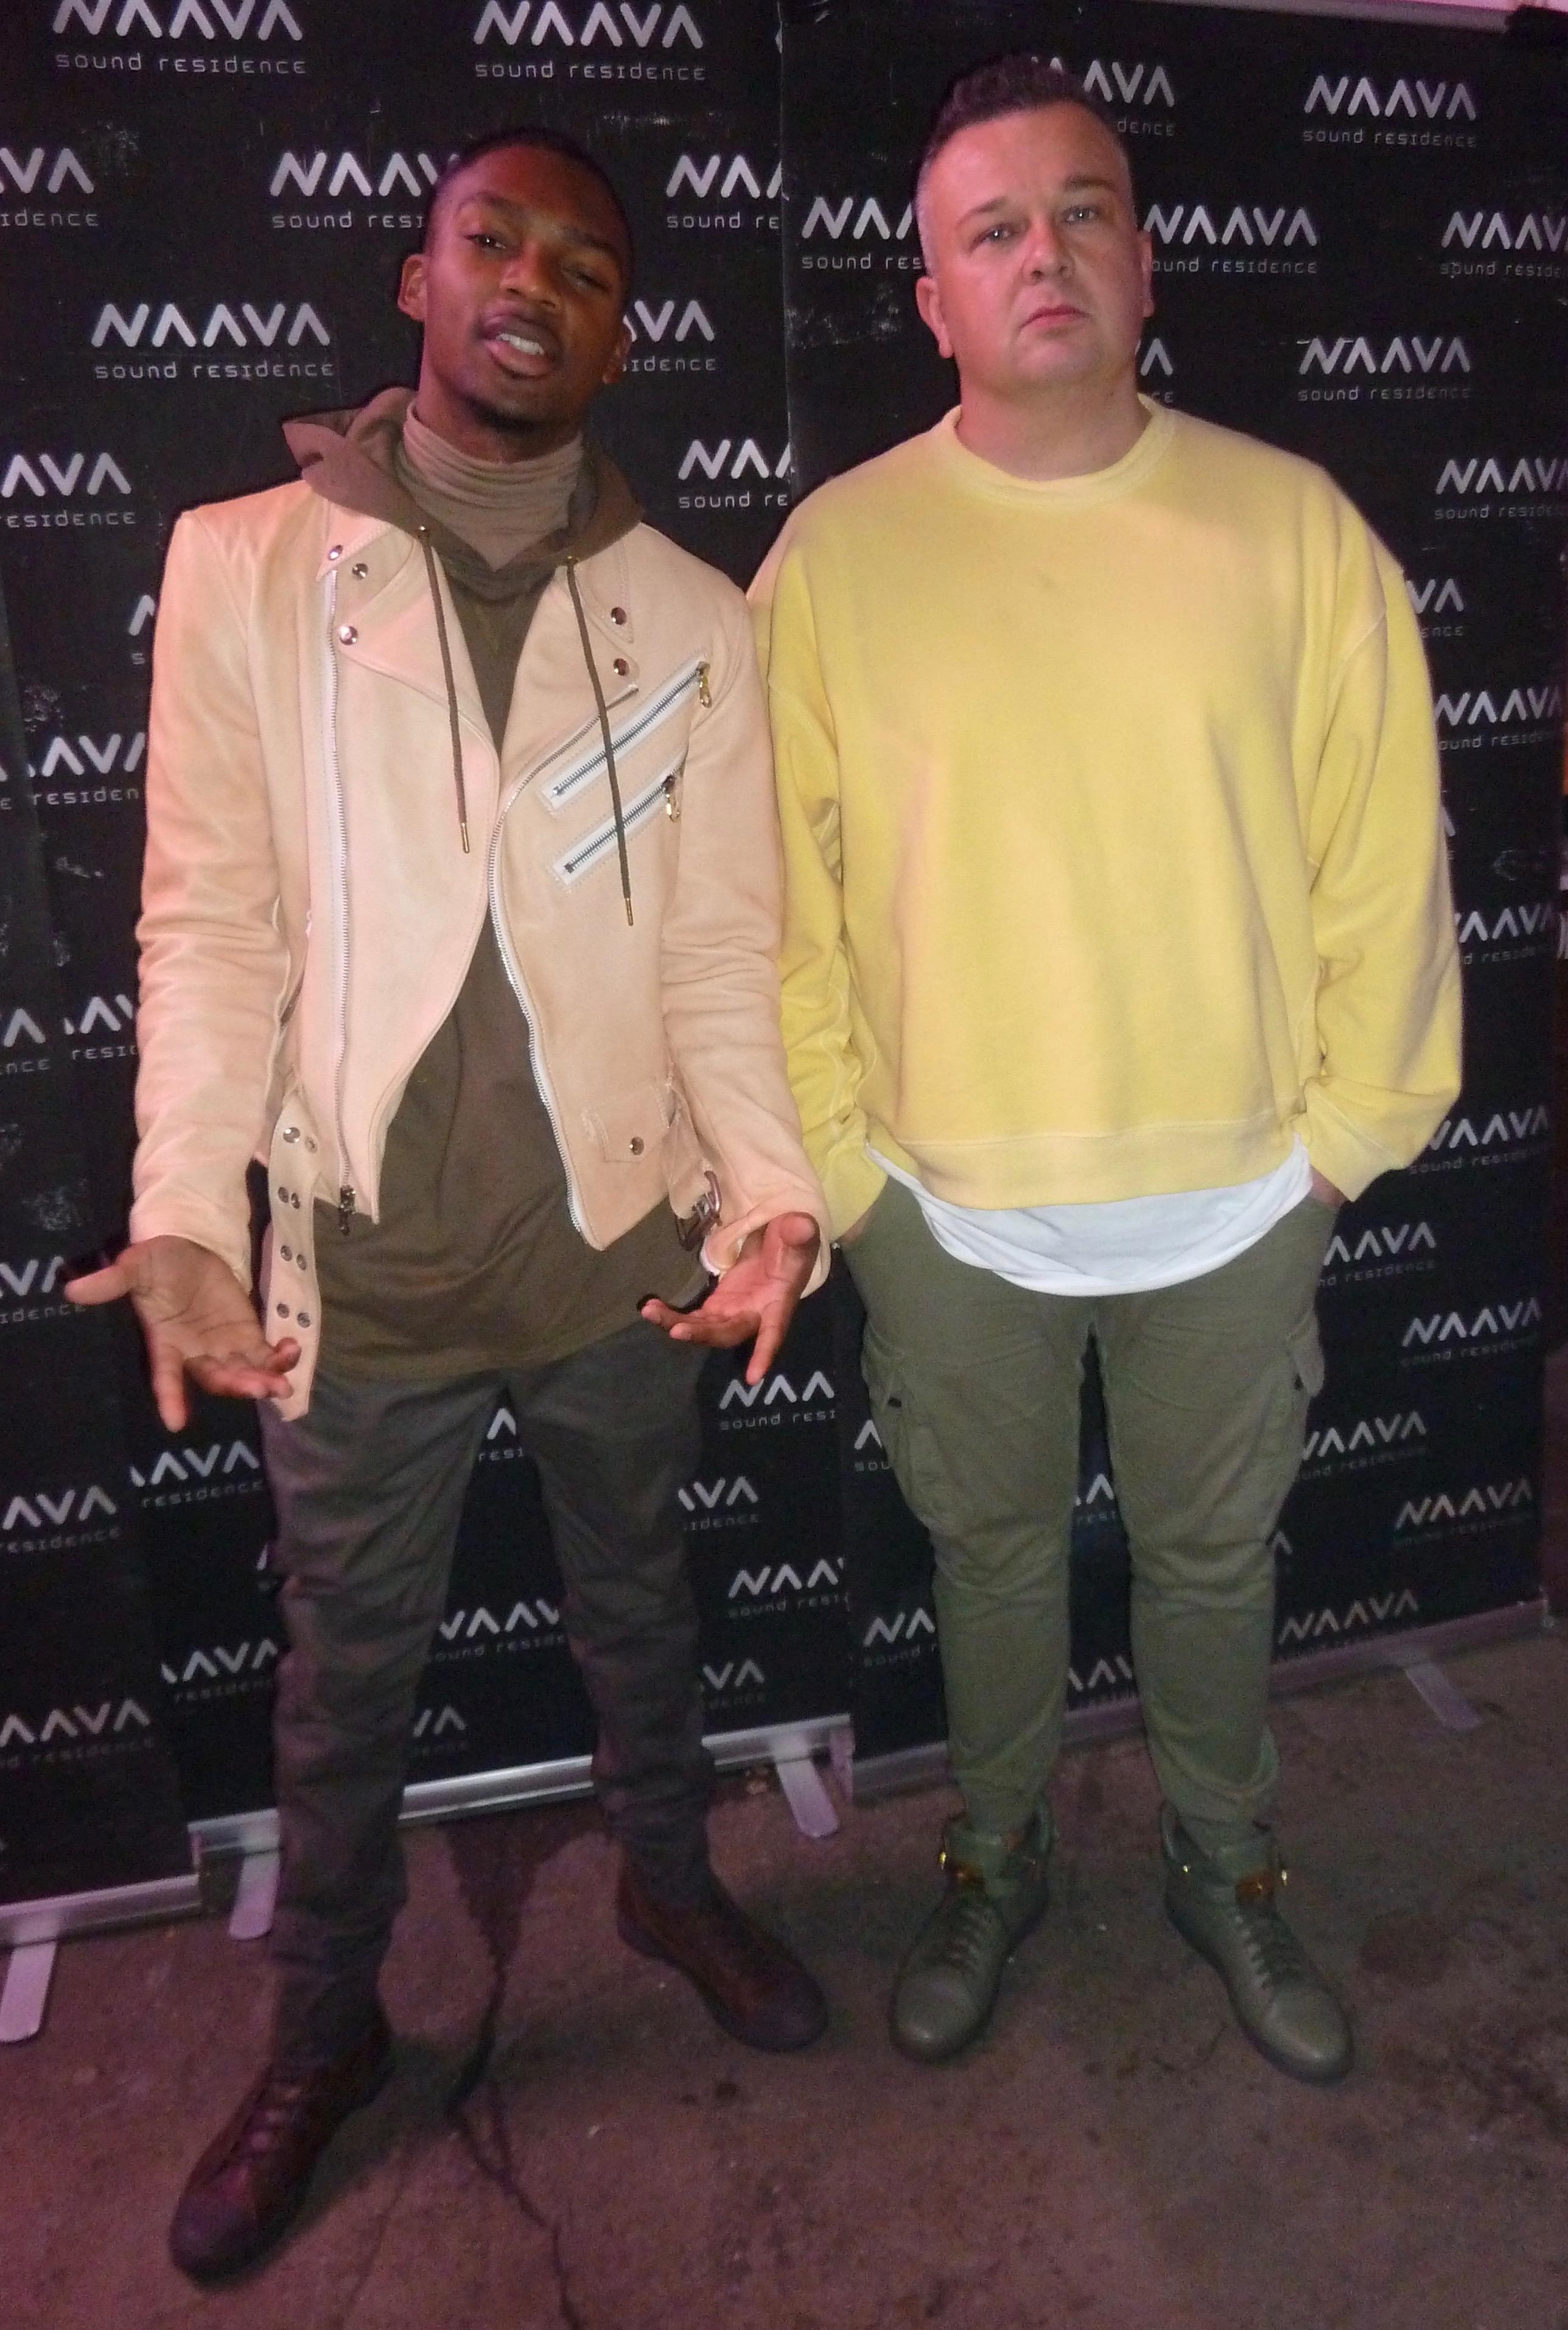 Mishon & Mirko KrazyToons On Anotha 1